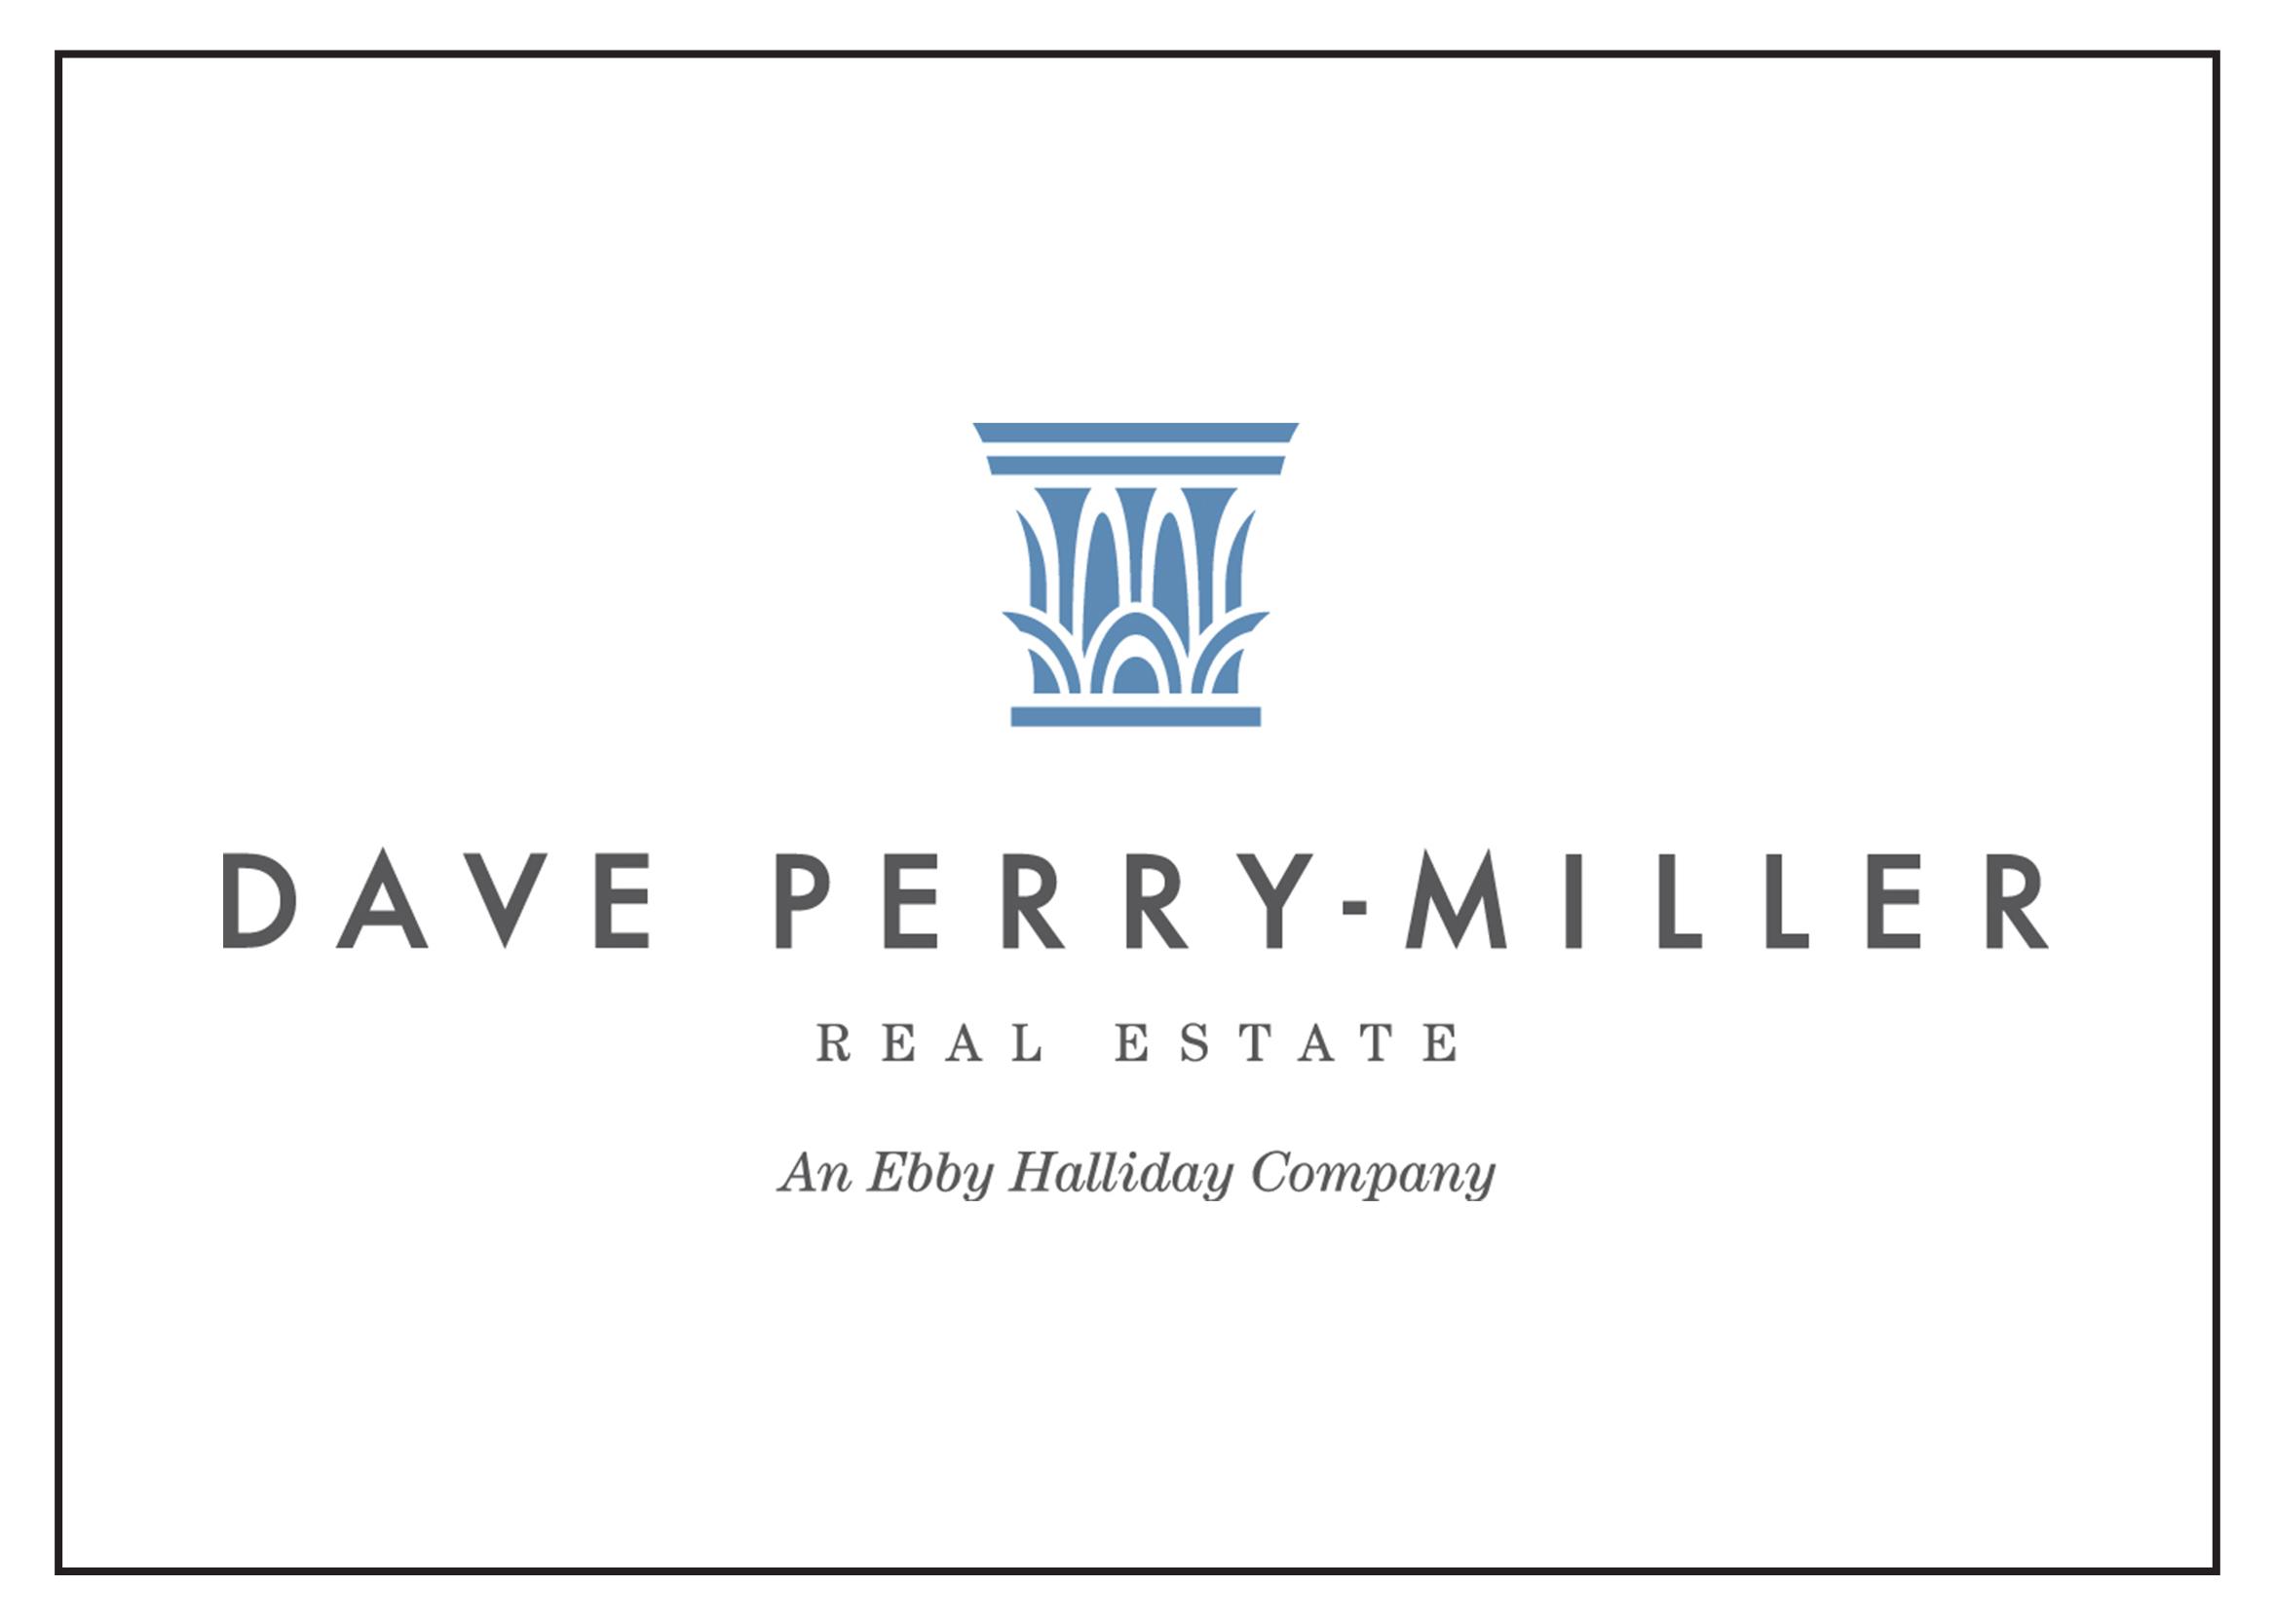 David Perry-Miller.jpg